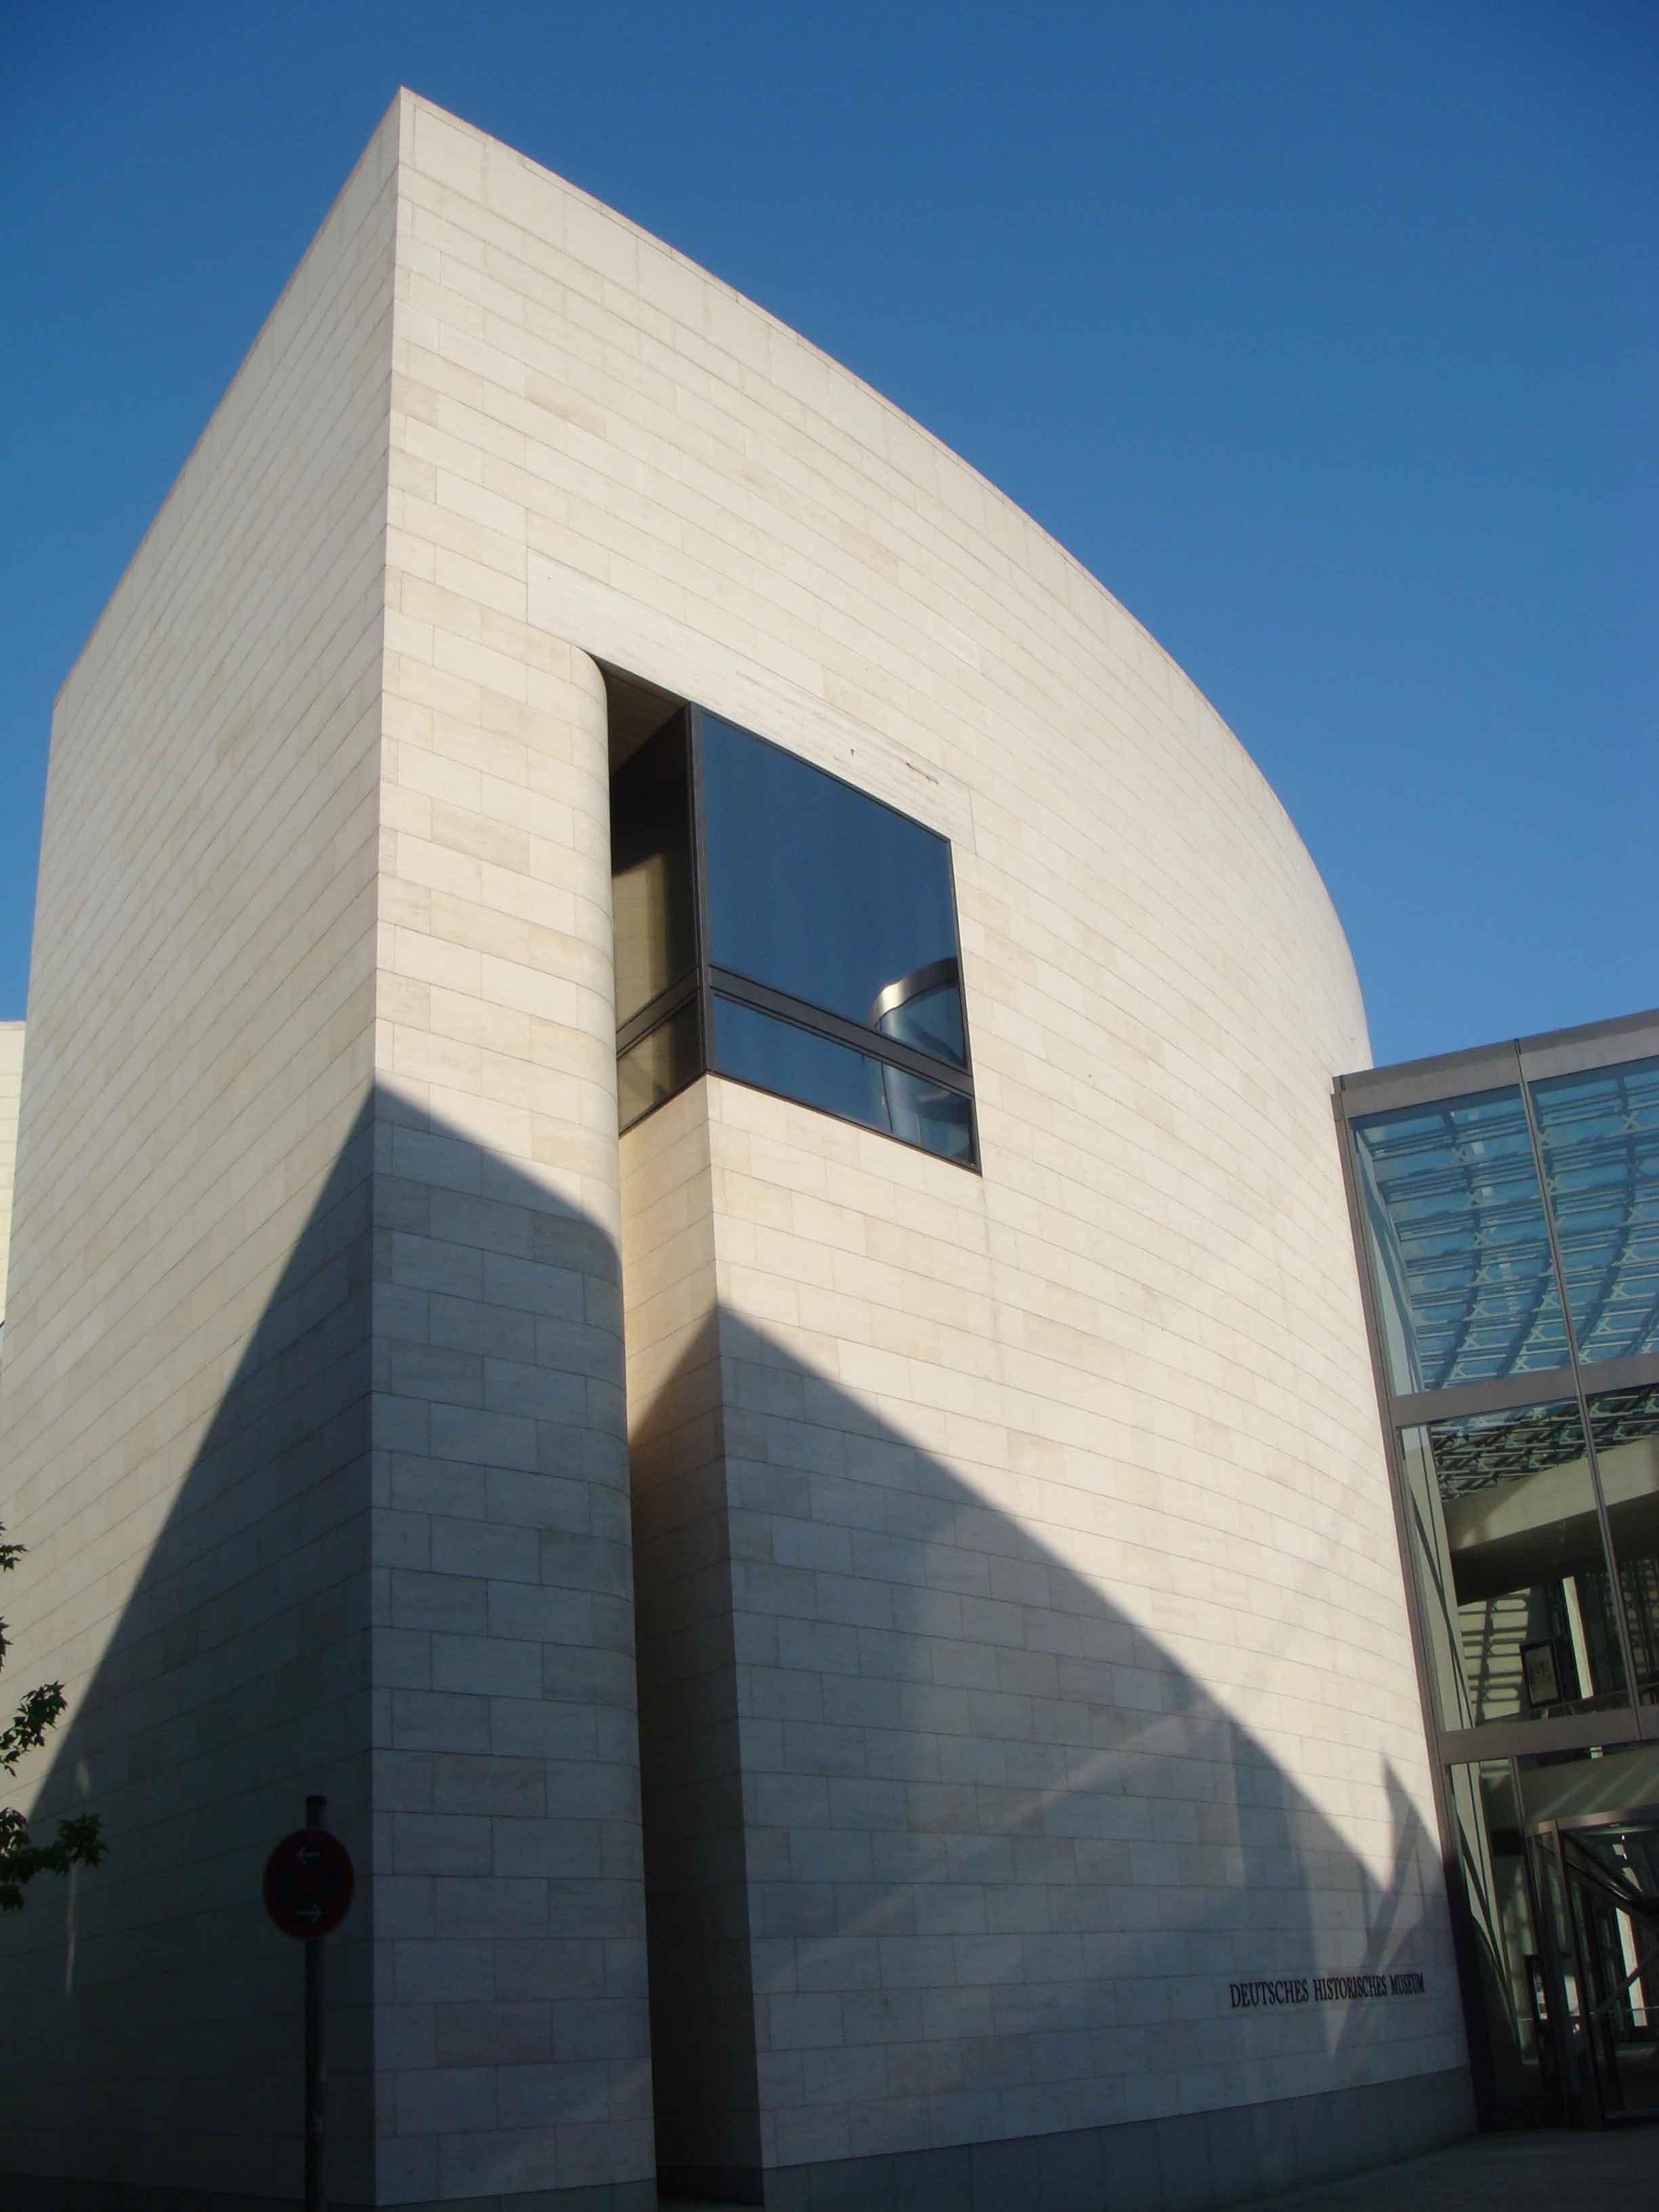 Berlin historical museum